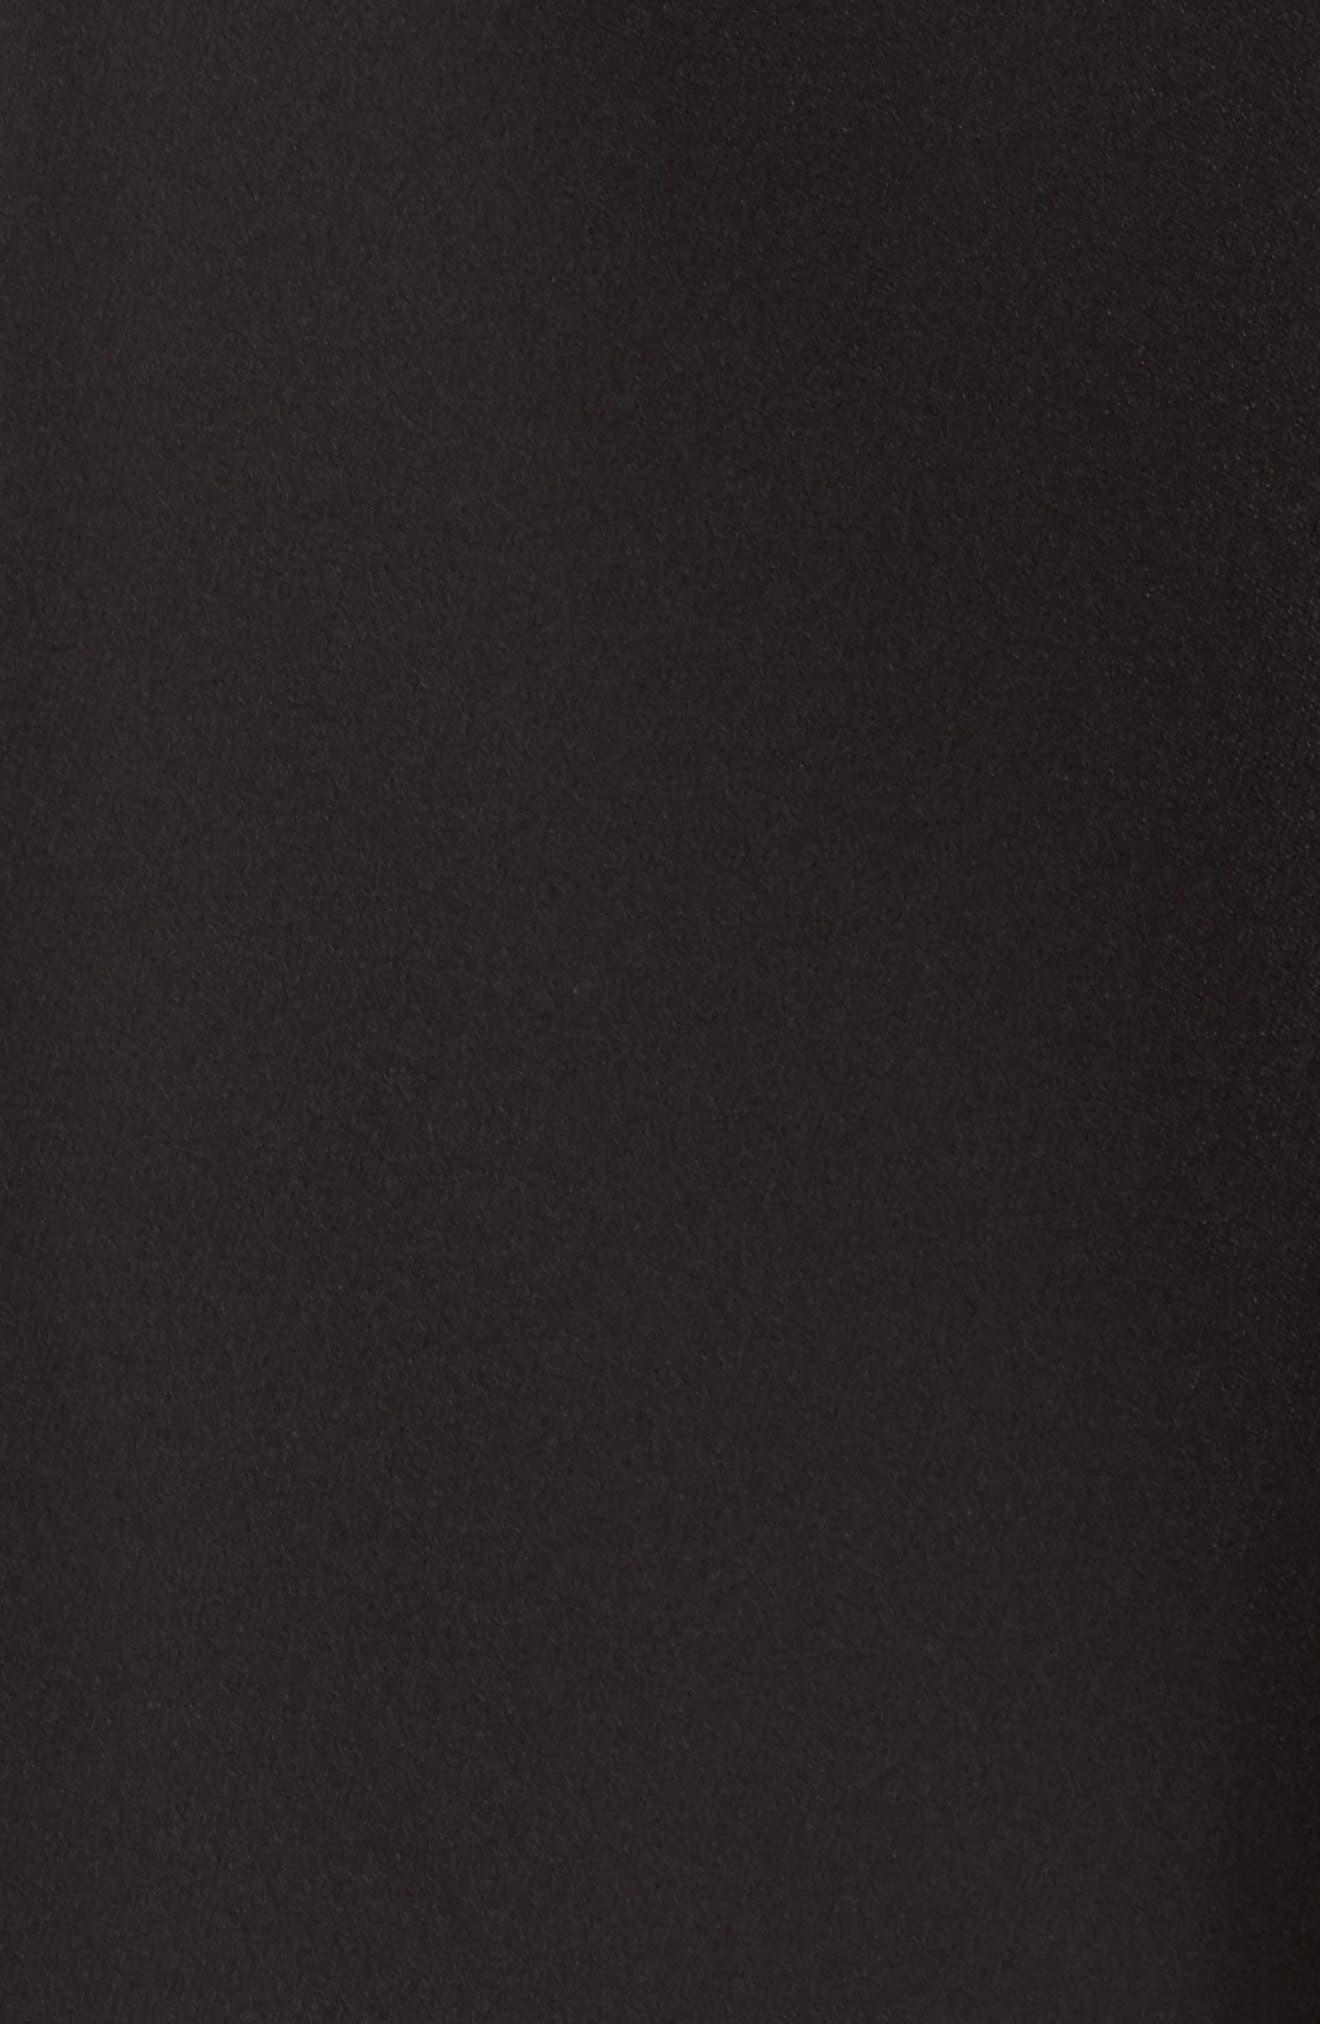 Bianca Back Cutout Fit & Flare Dress,                             Alternate thumbnail 6, color,                             Black